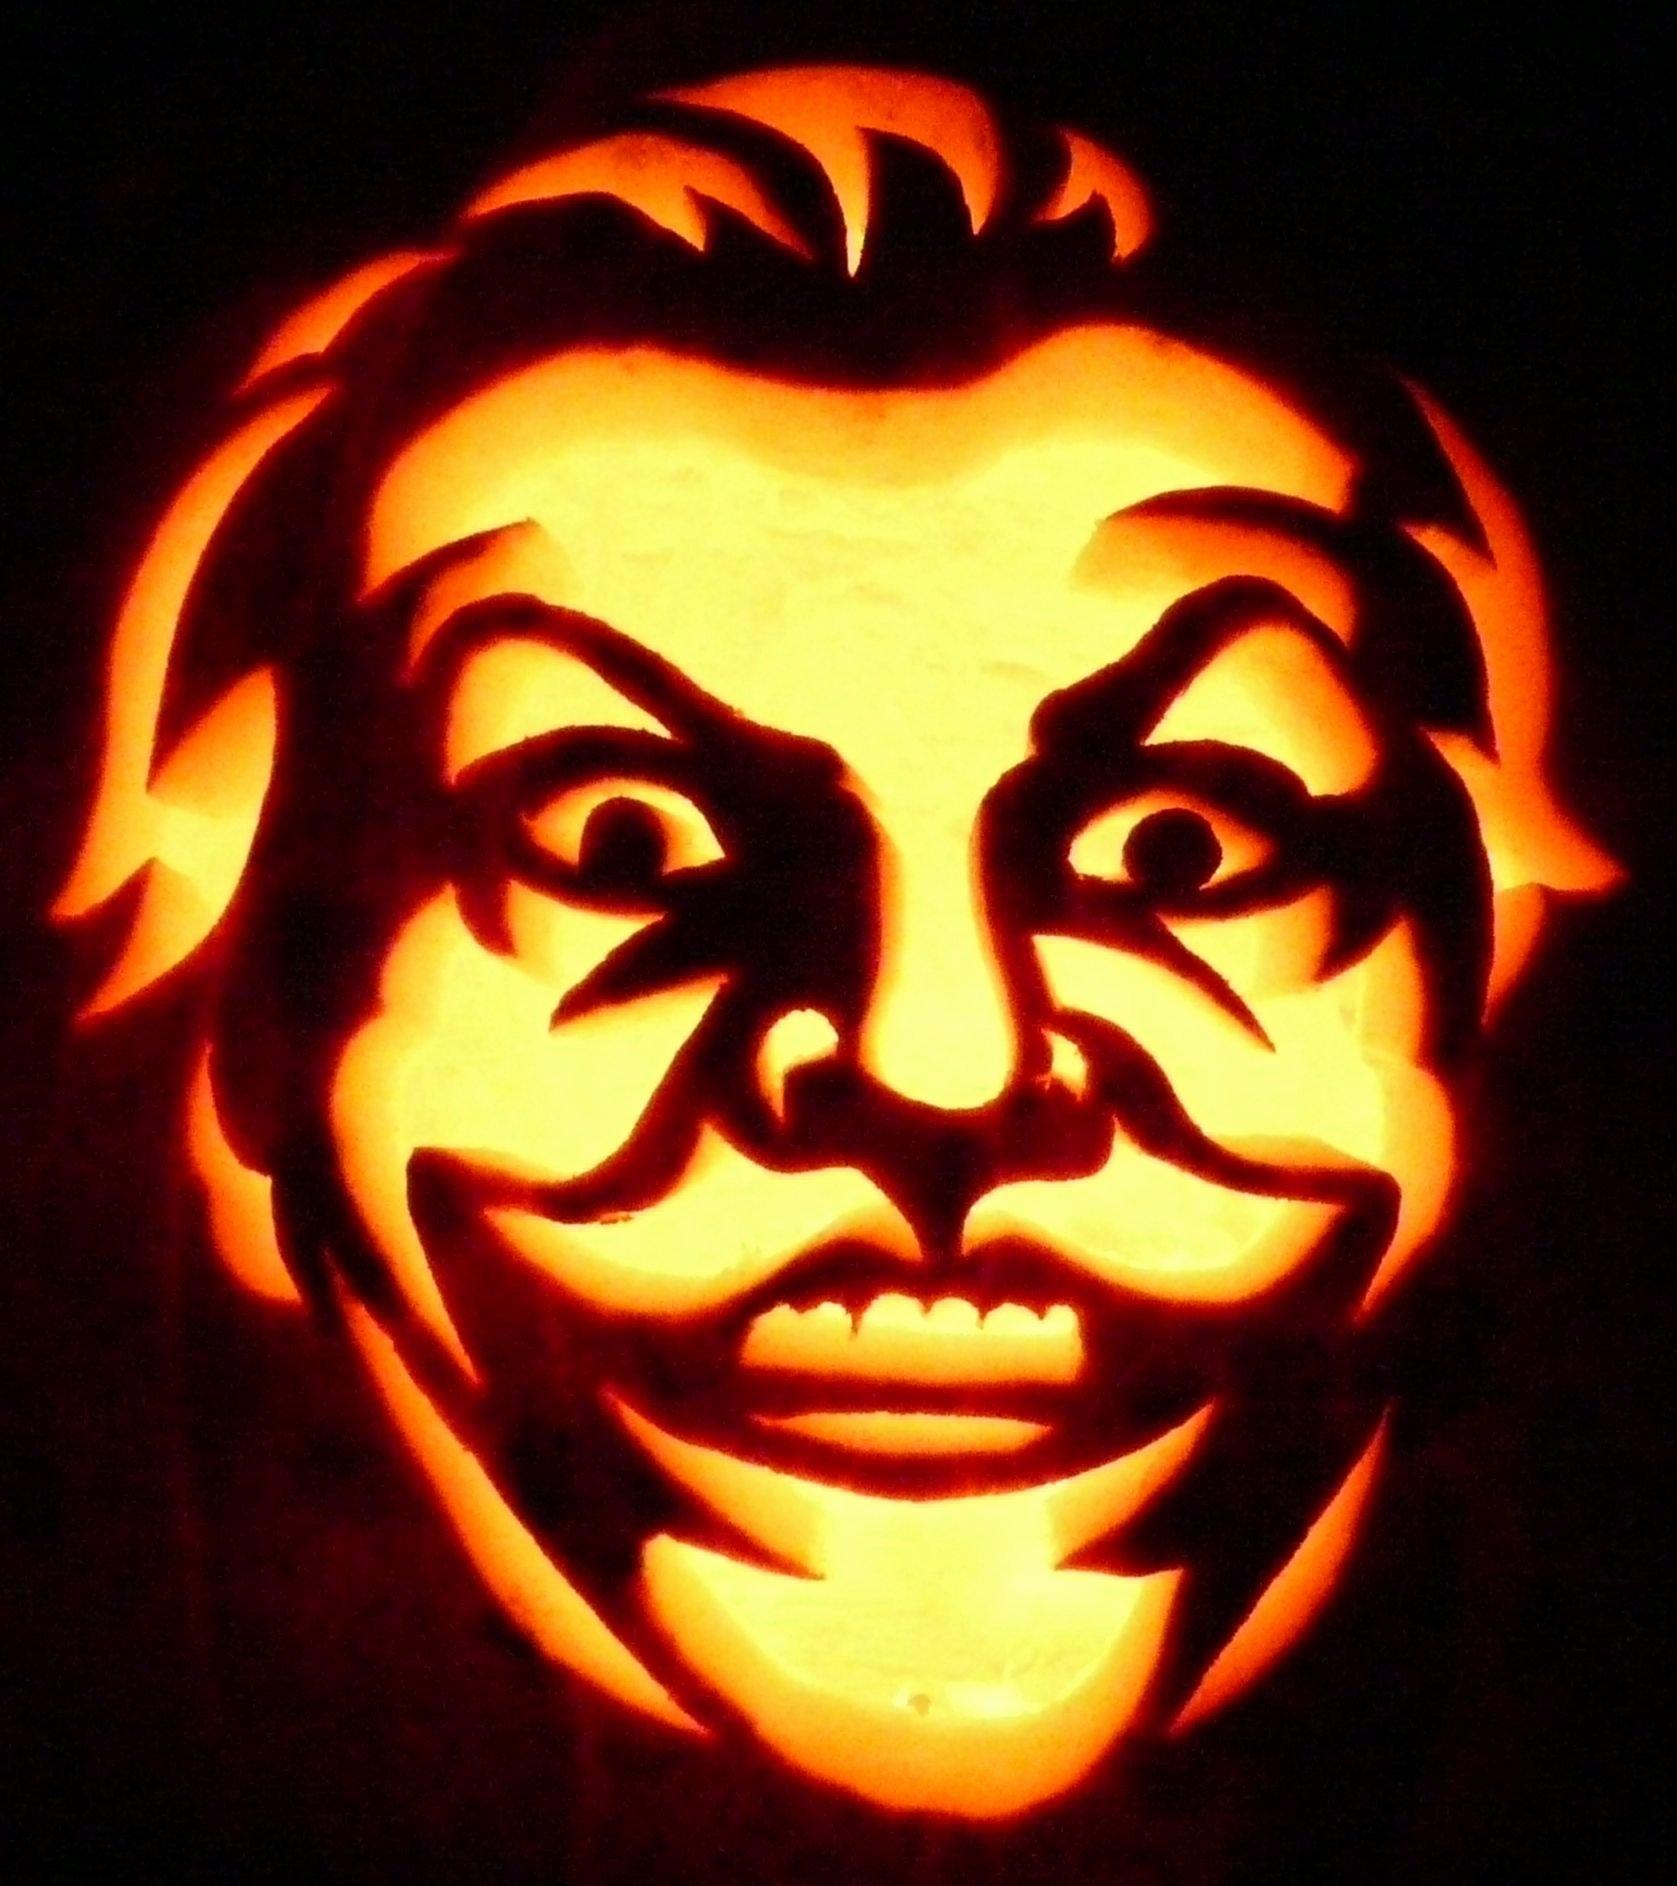 Joker Pumpkin Stencils Elegant Carved Pumpkin Jack Nicholson Joker